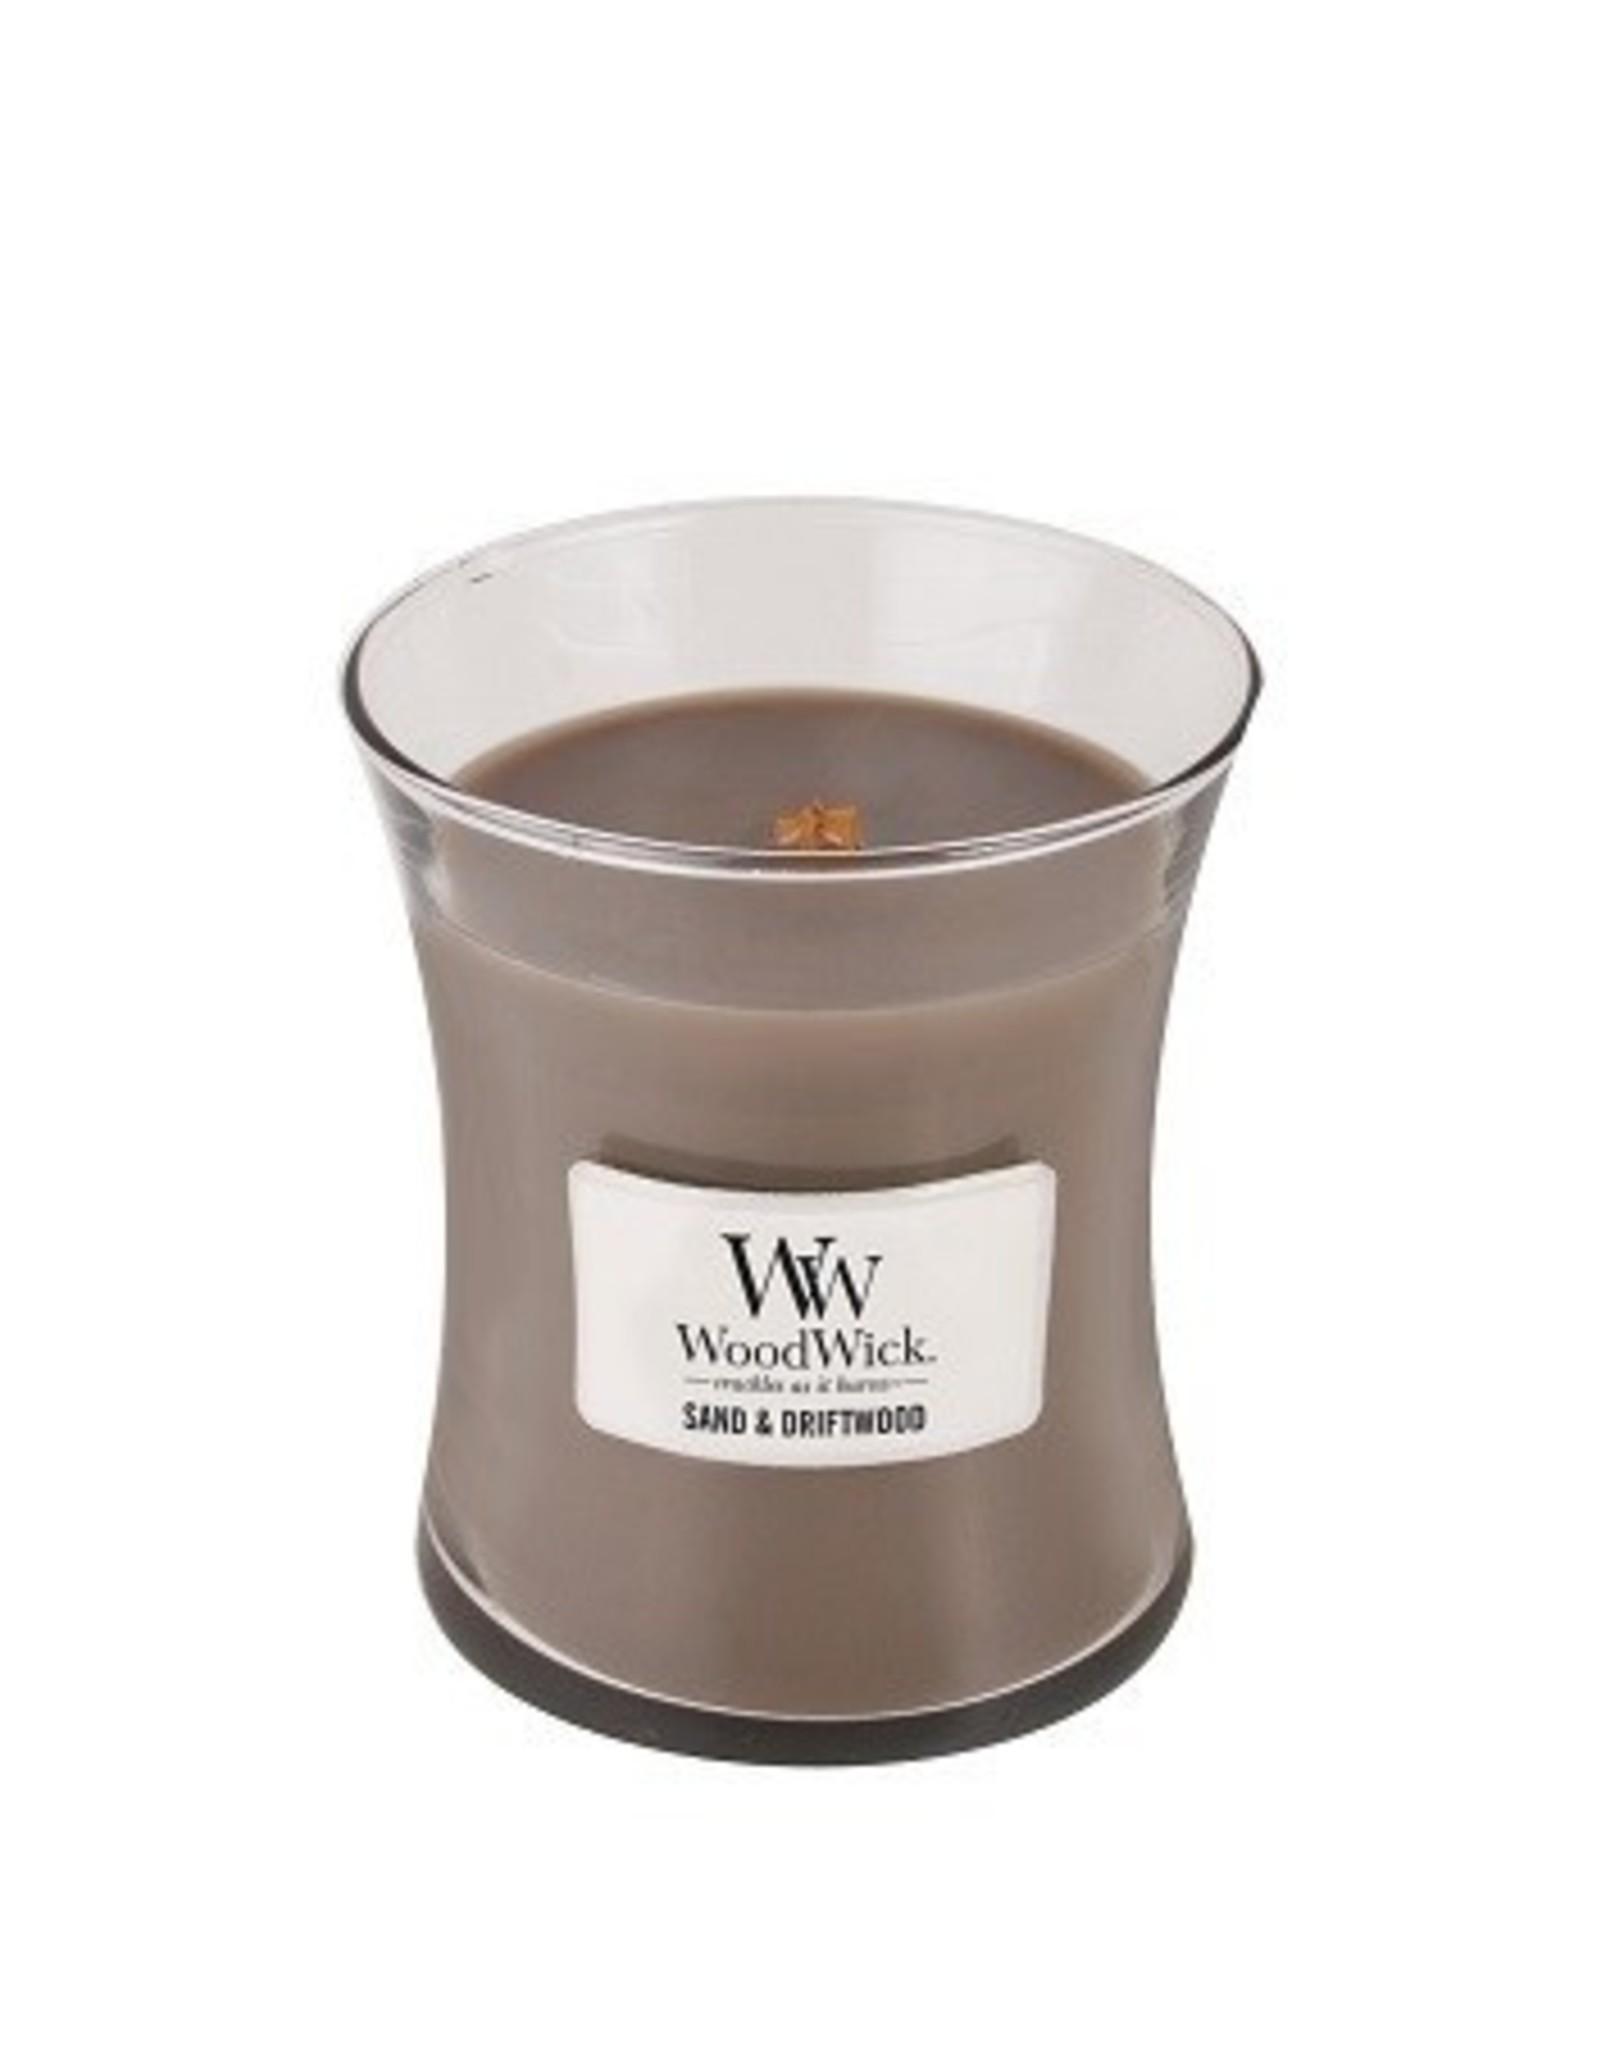 Woodwick Woodwick Sand & Driftwood Medium Candle